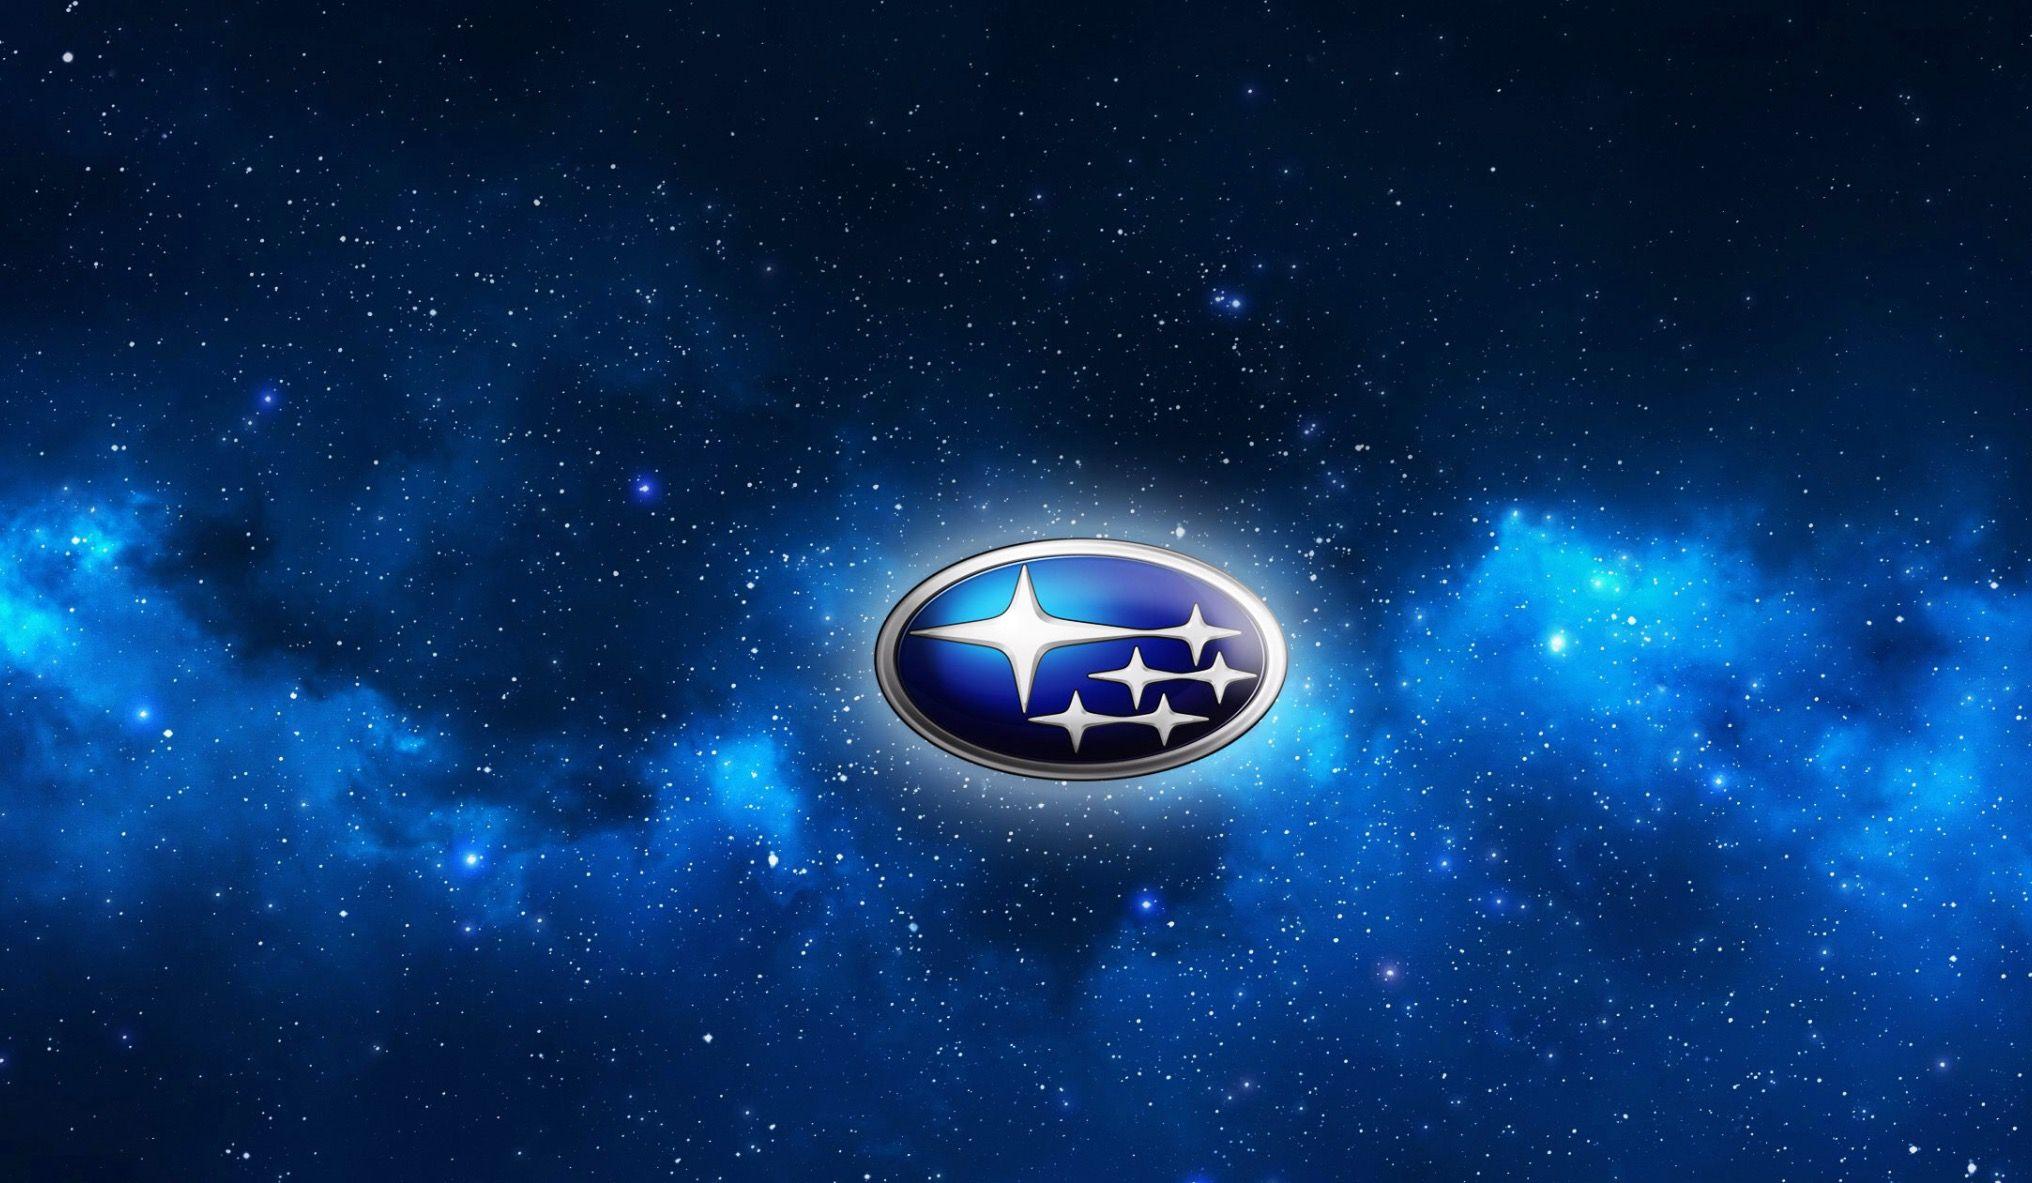 Free Subaru Logo Wallpaper For Iphone Long Wallpapers Subaru Logo Subaru Sti Subaru